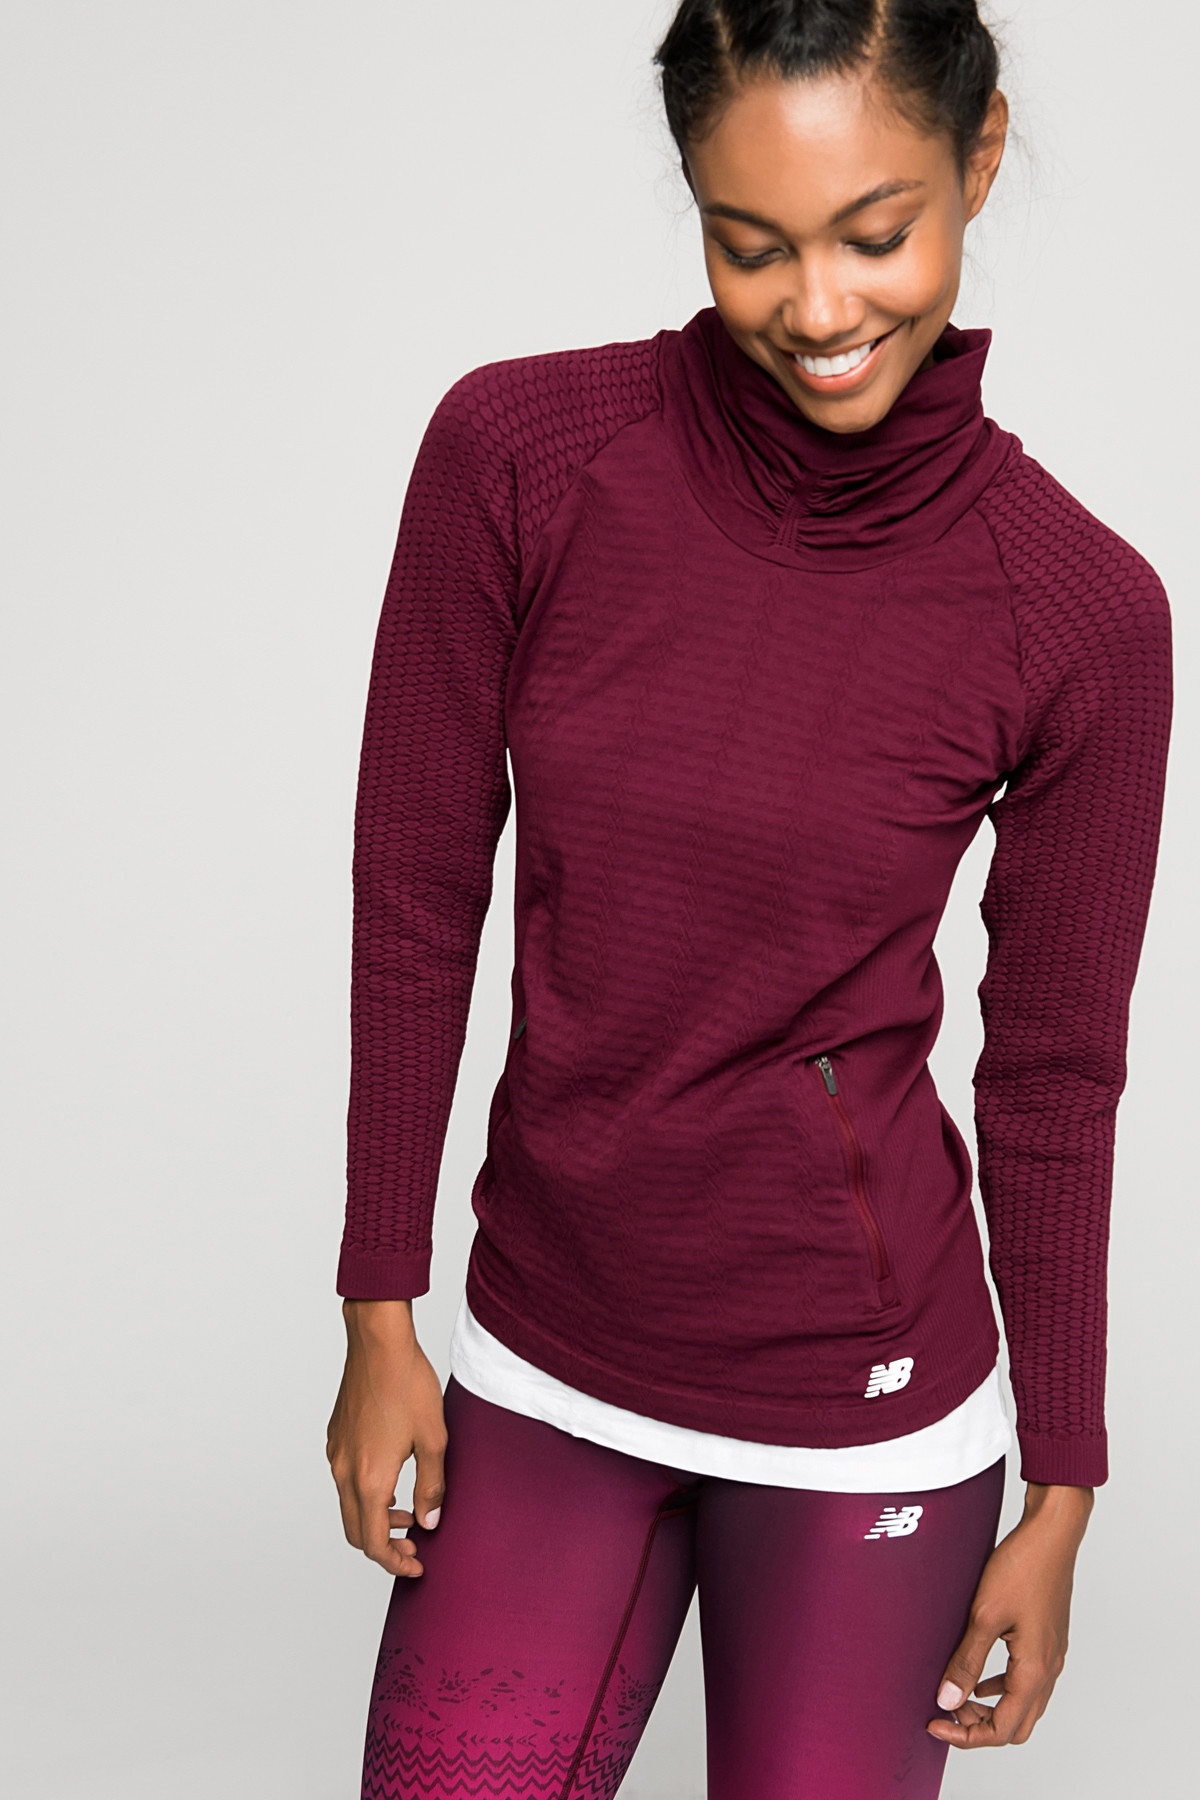 Kadın Bordo Sweatshirt - WT63136-SDR